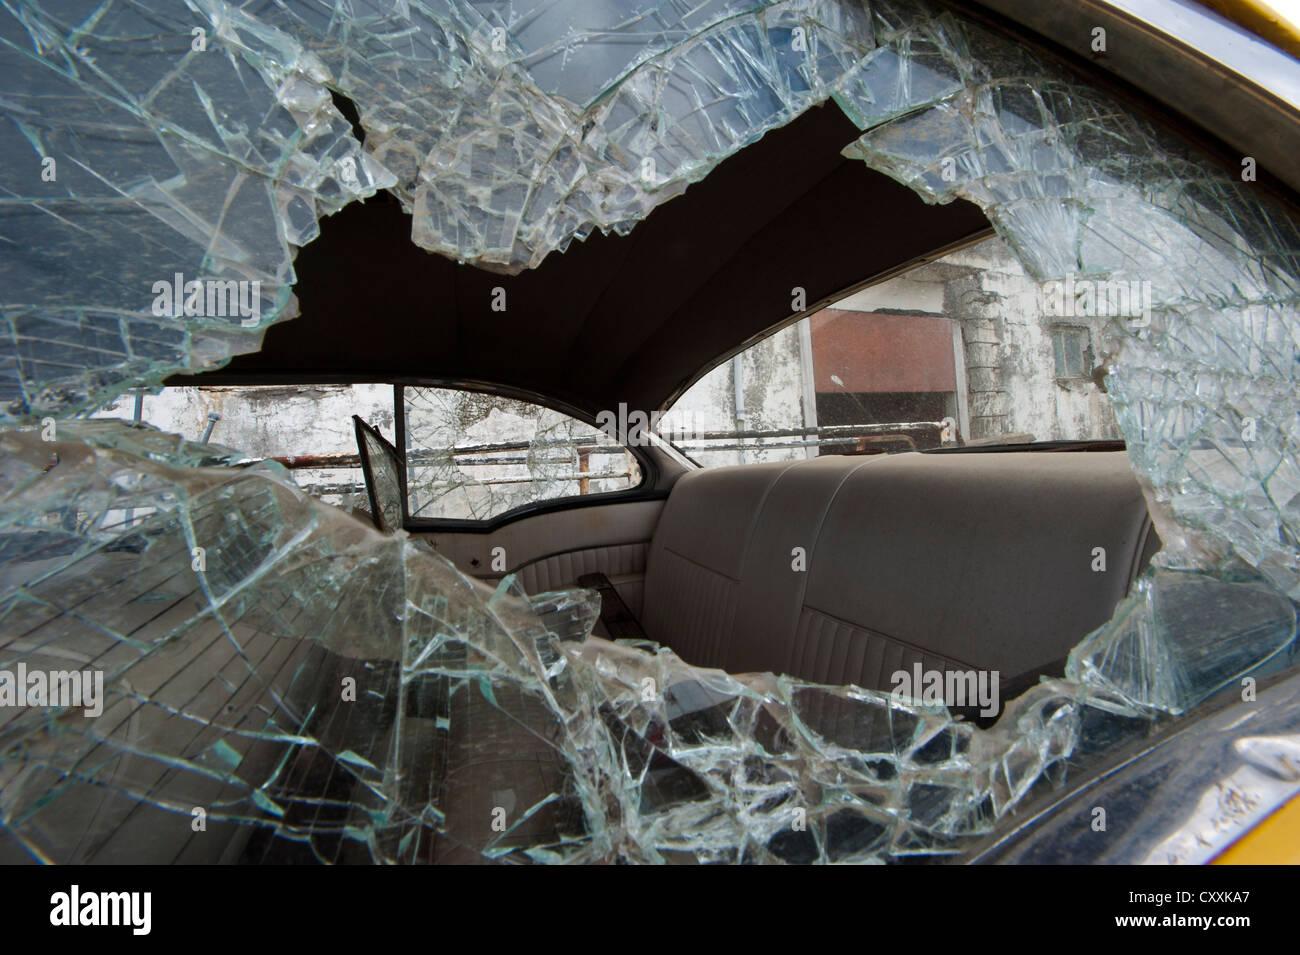 Ventana de coche destrozado, ciudad de Djúpavík, Reykjarfjoerður fjord Strandir, Westfjords, Islandia, Imagen De Stock